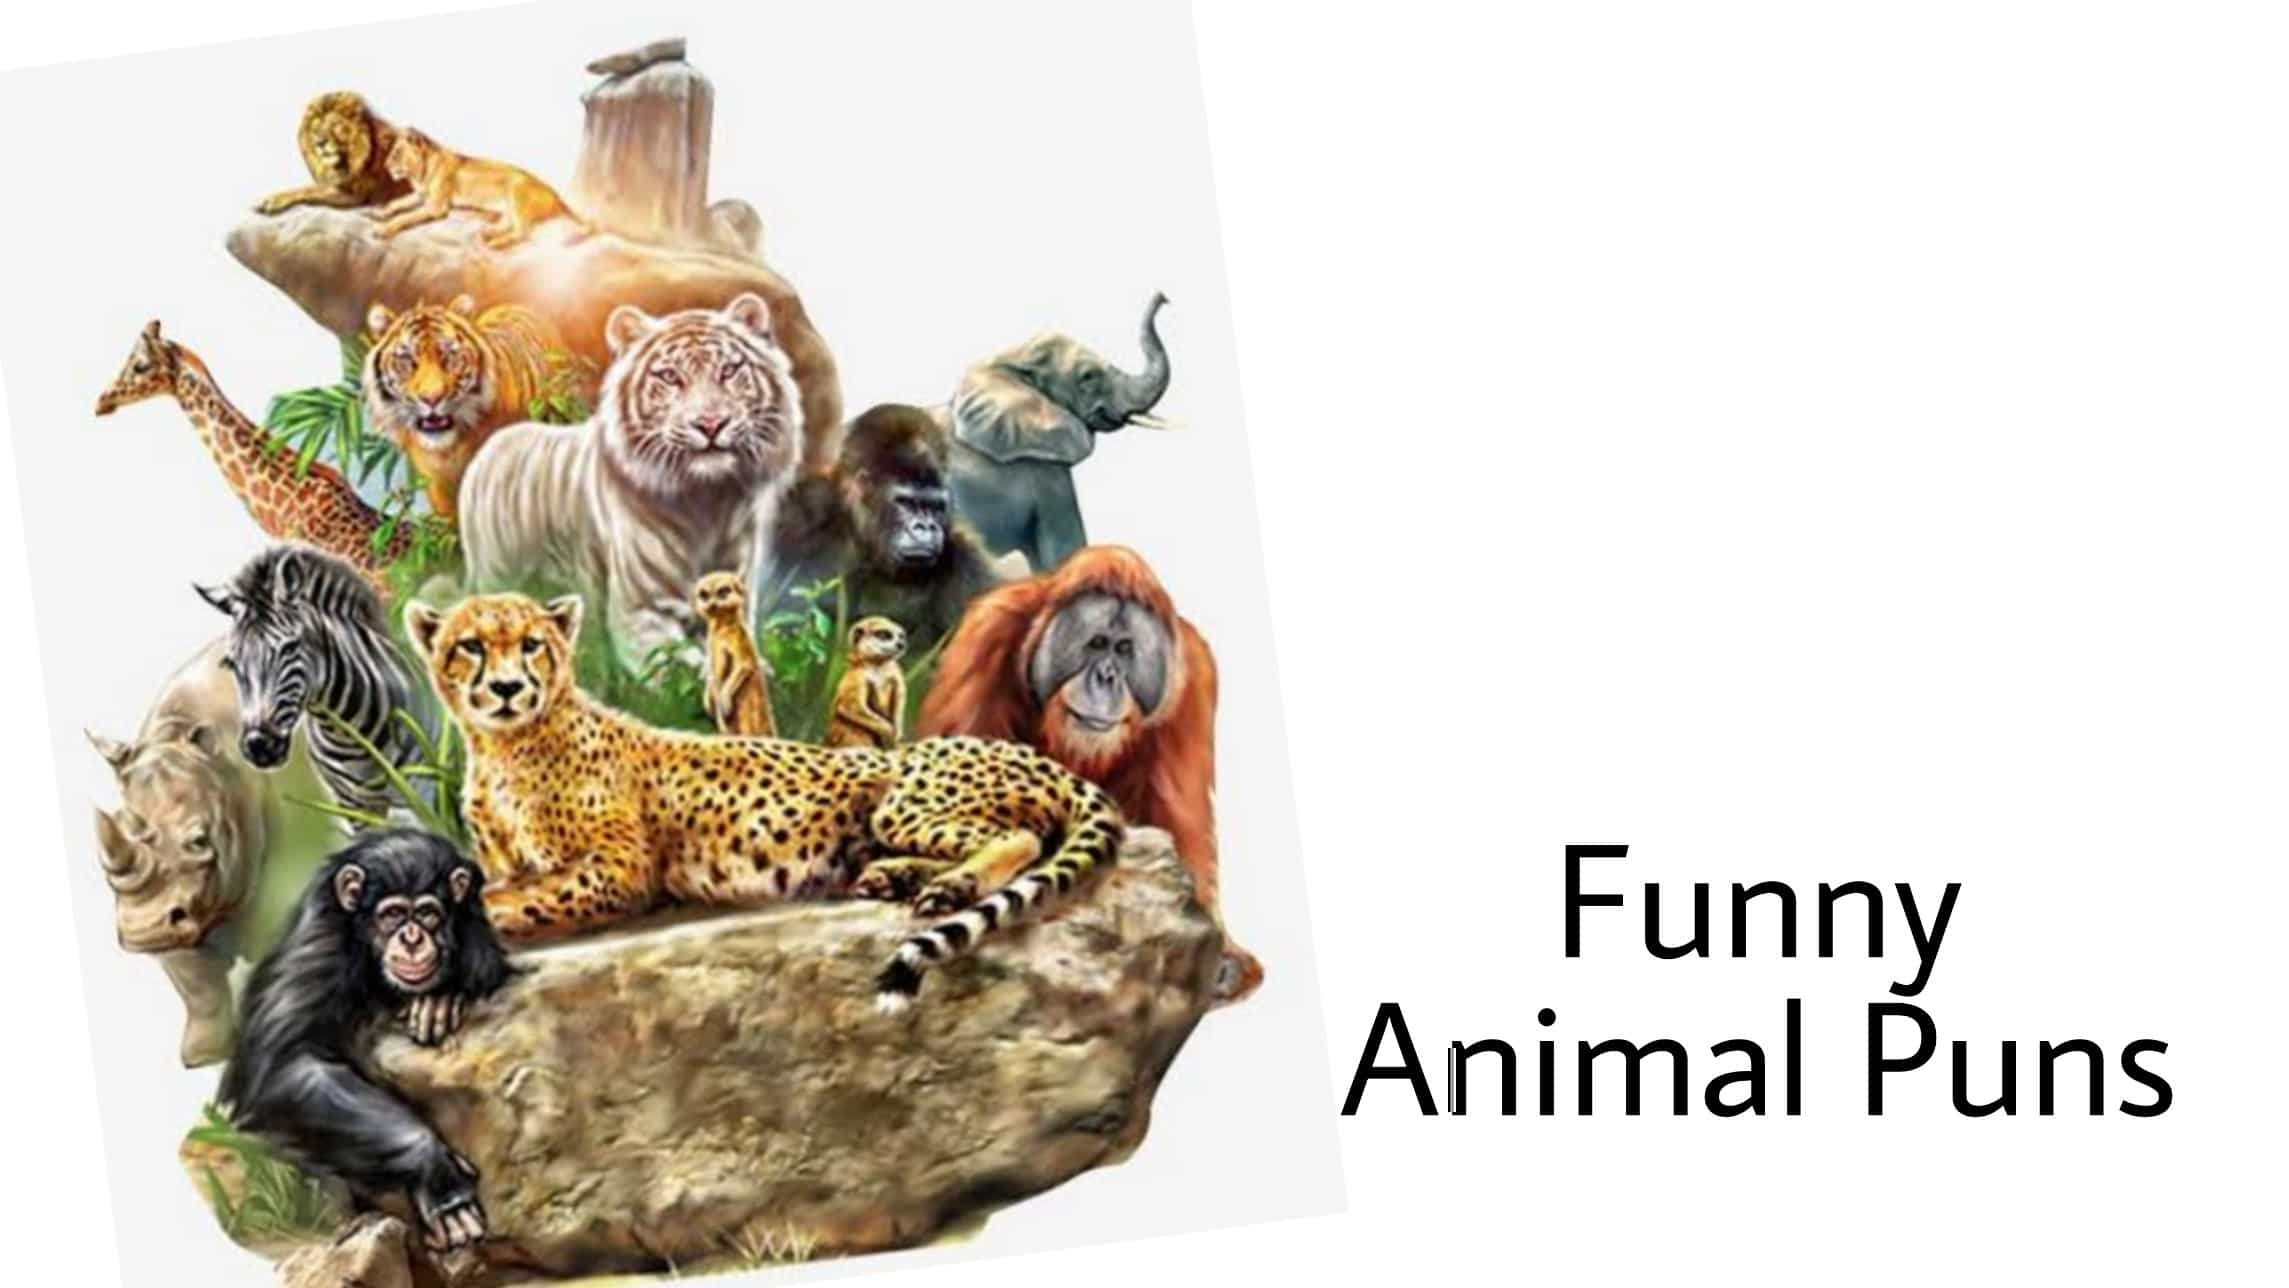 funniest animal puns